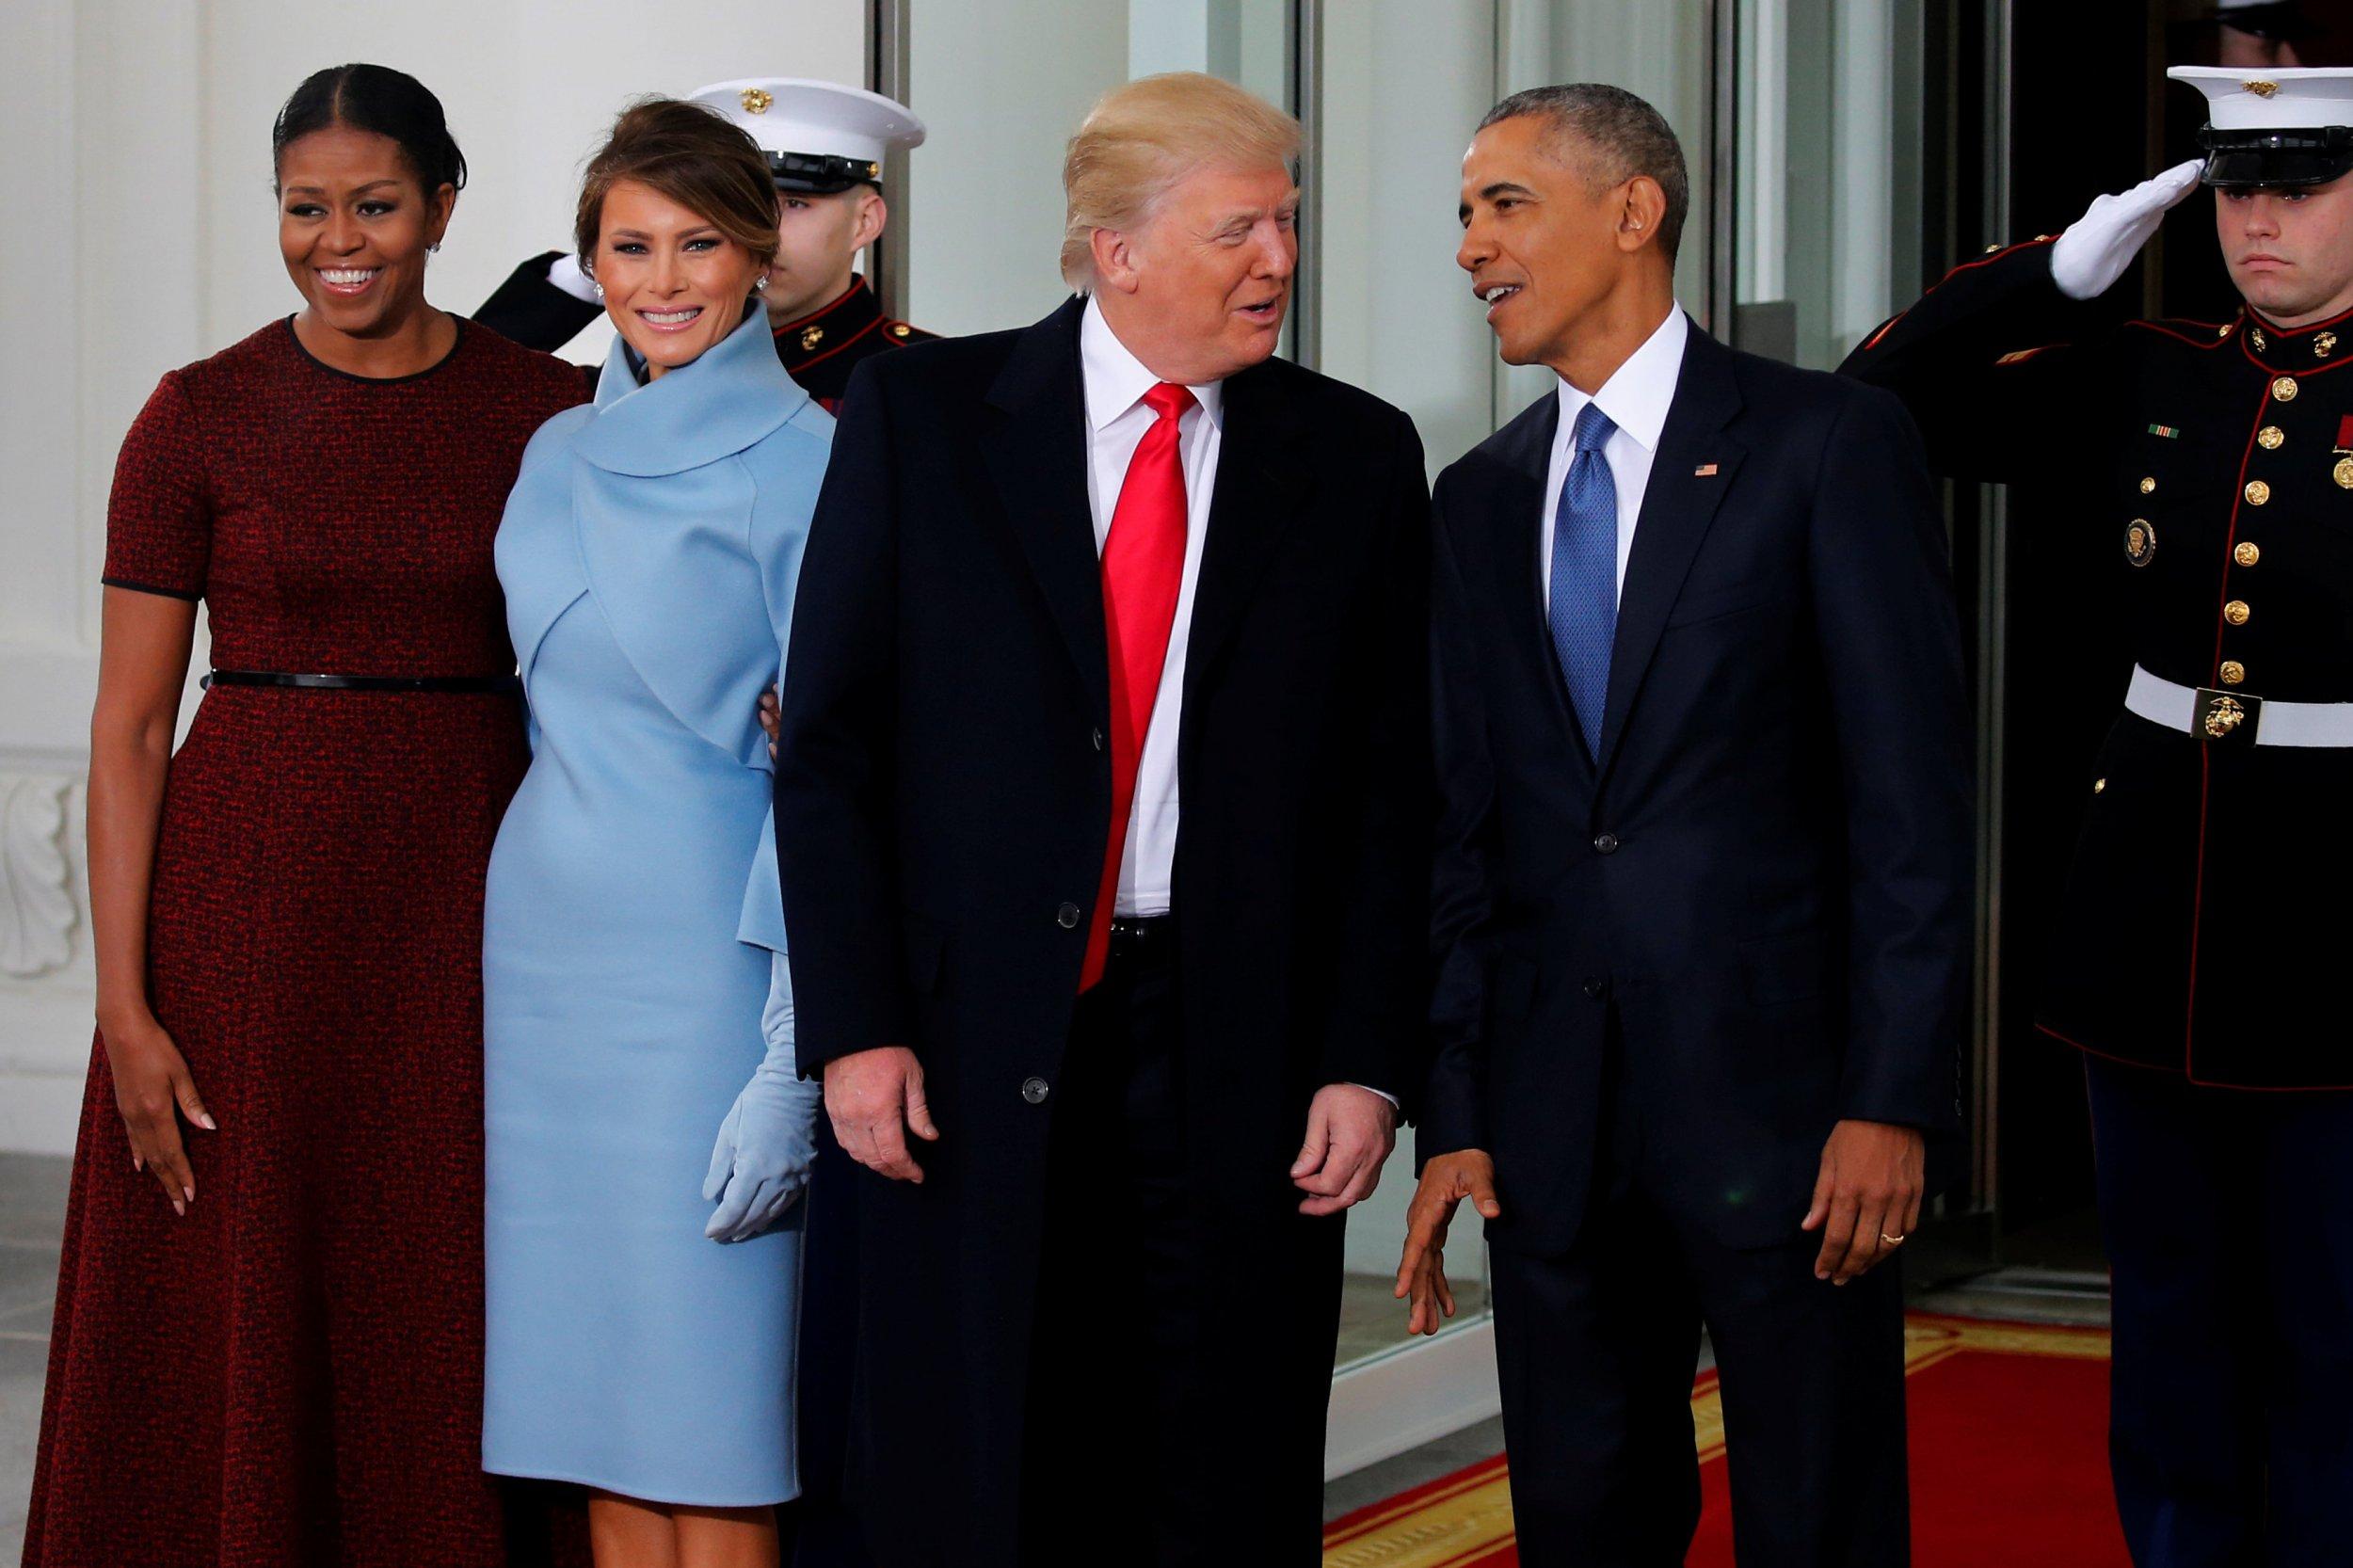 trump_inauguration_07_0120